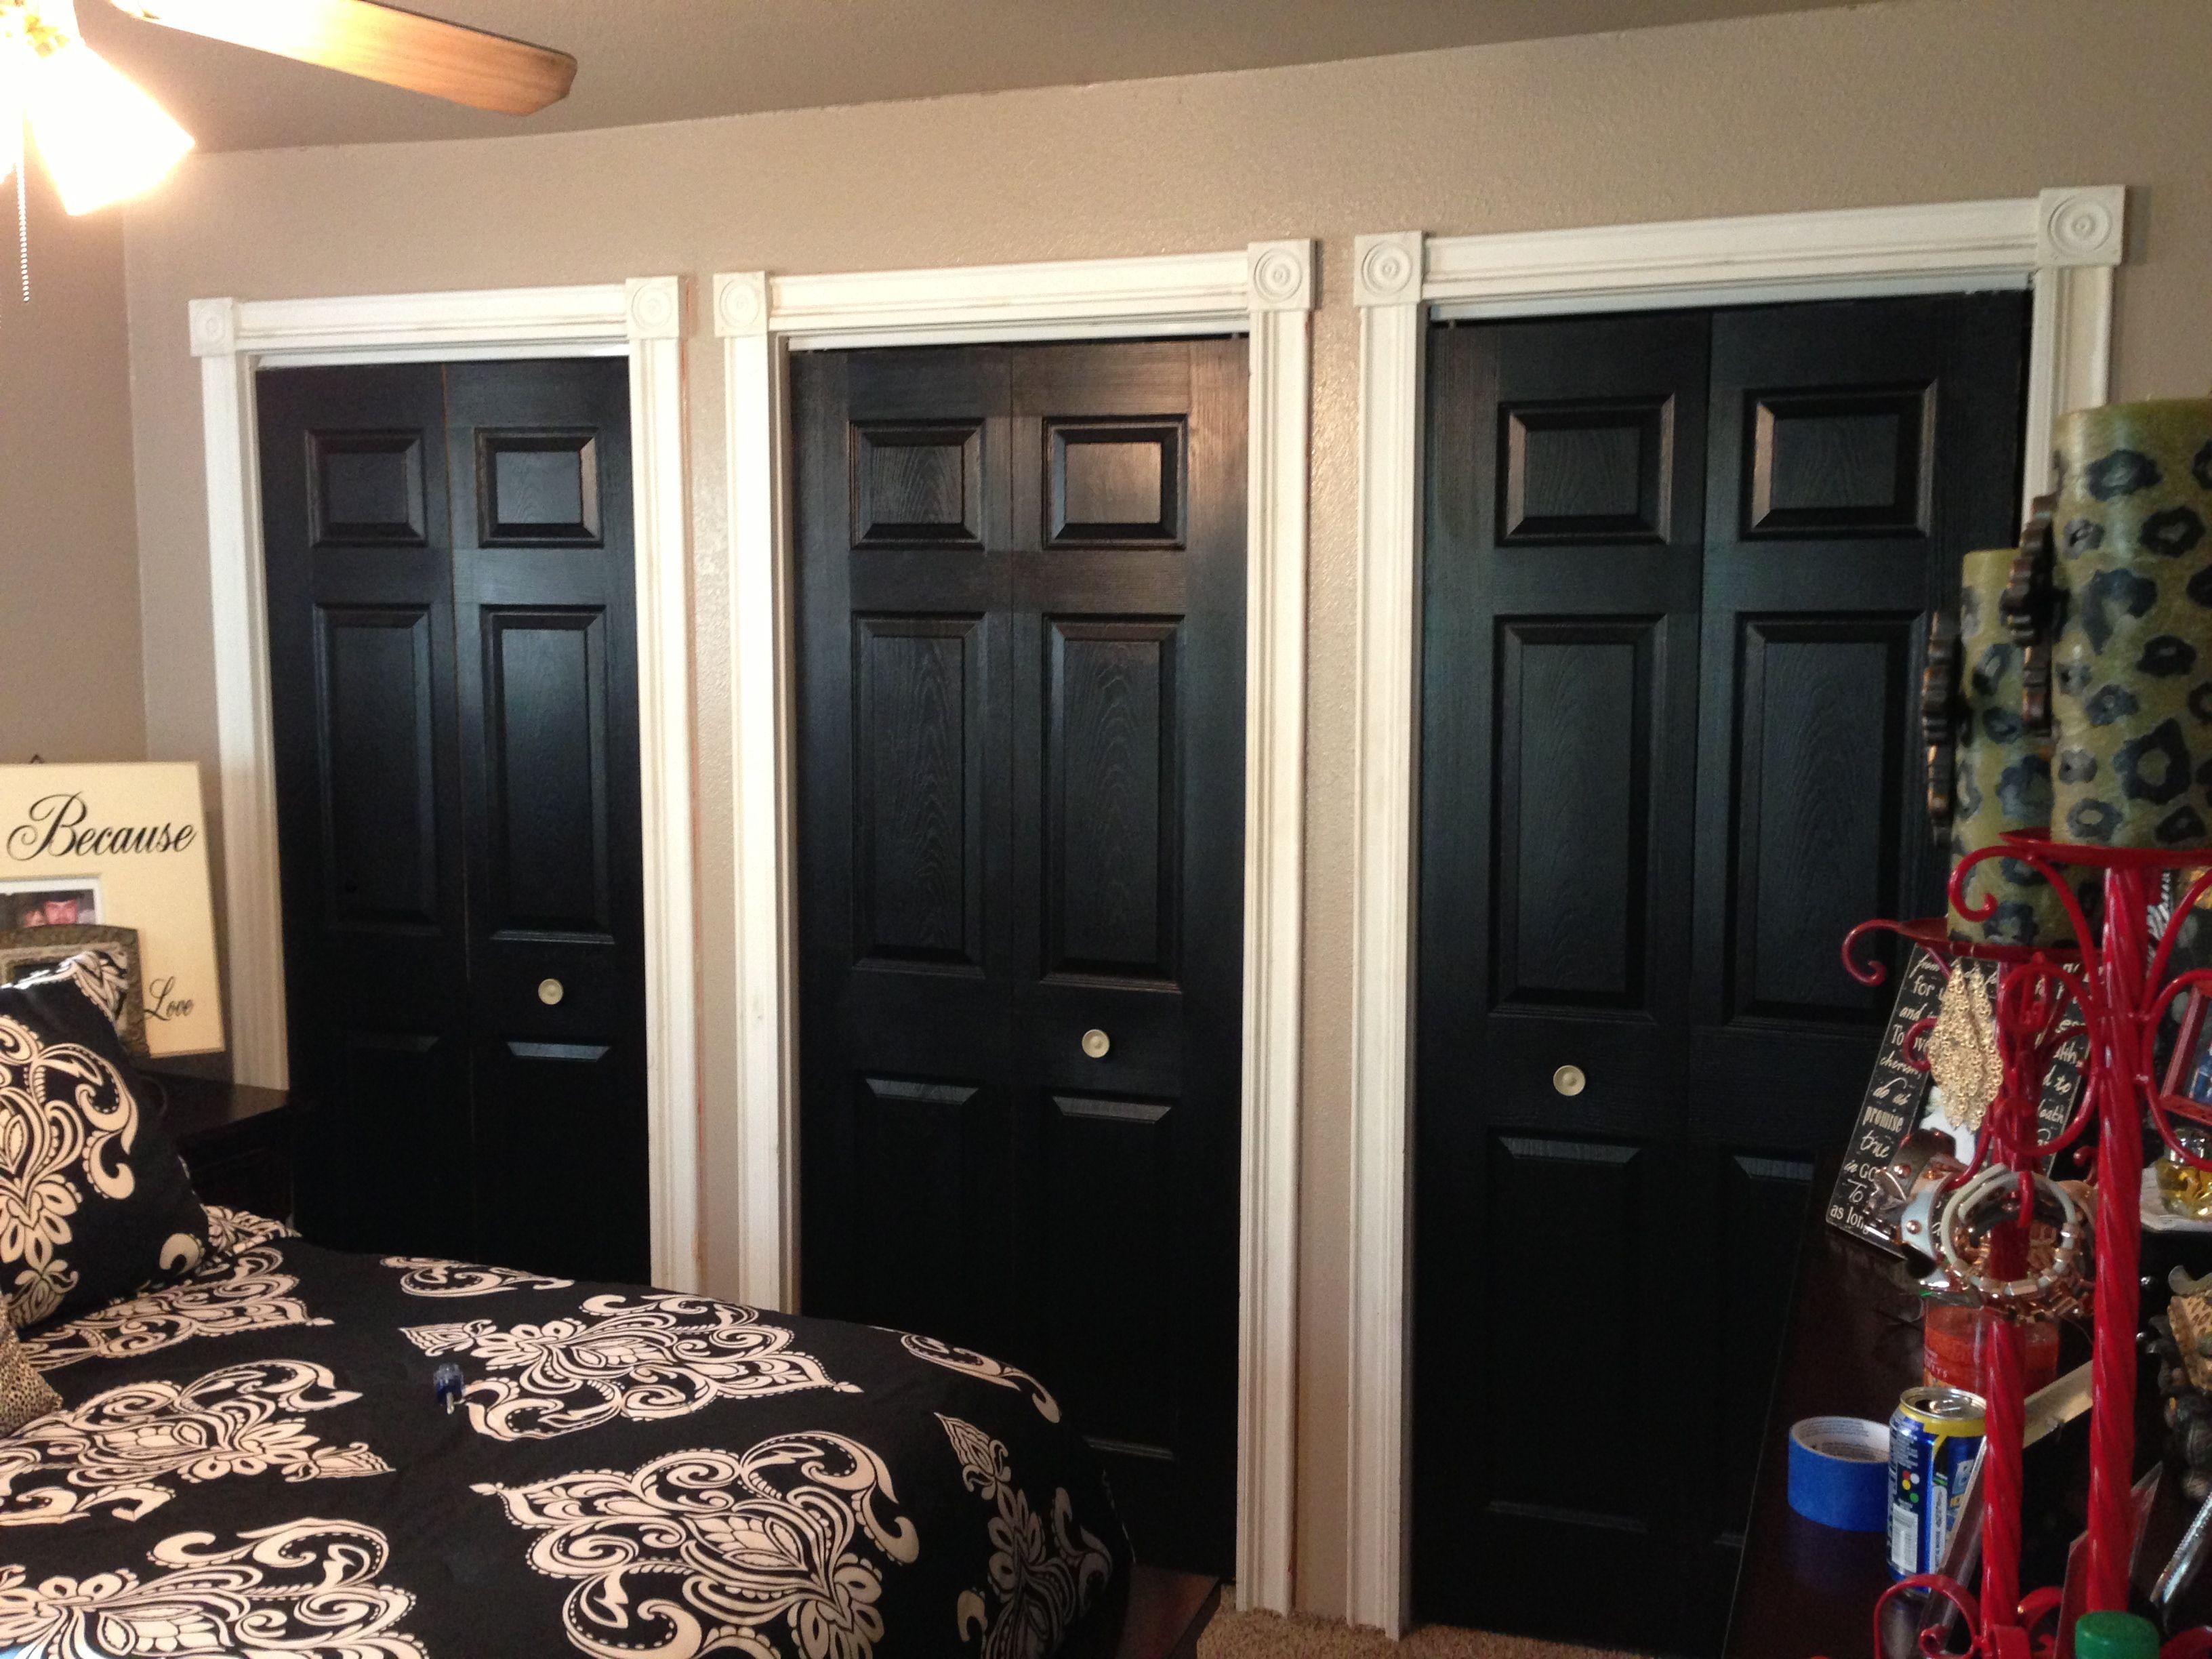 Black Closet Doors! Love!